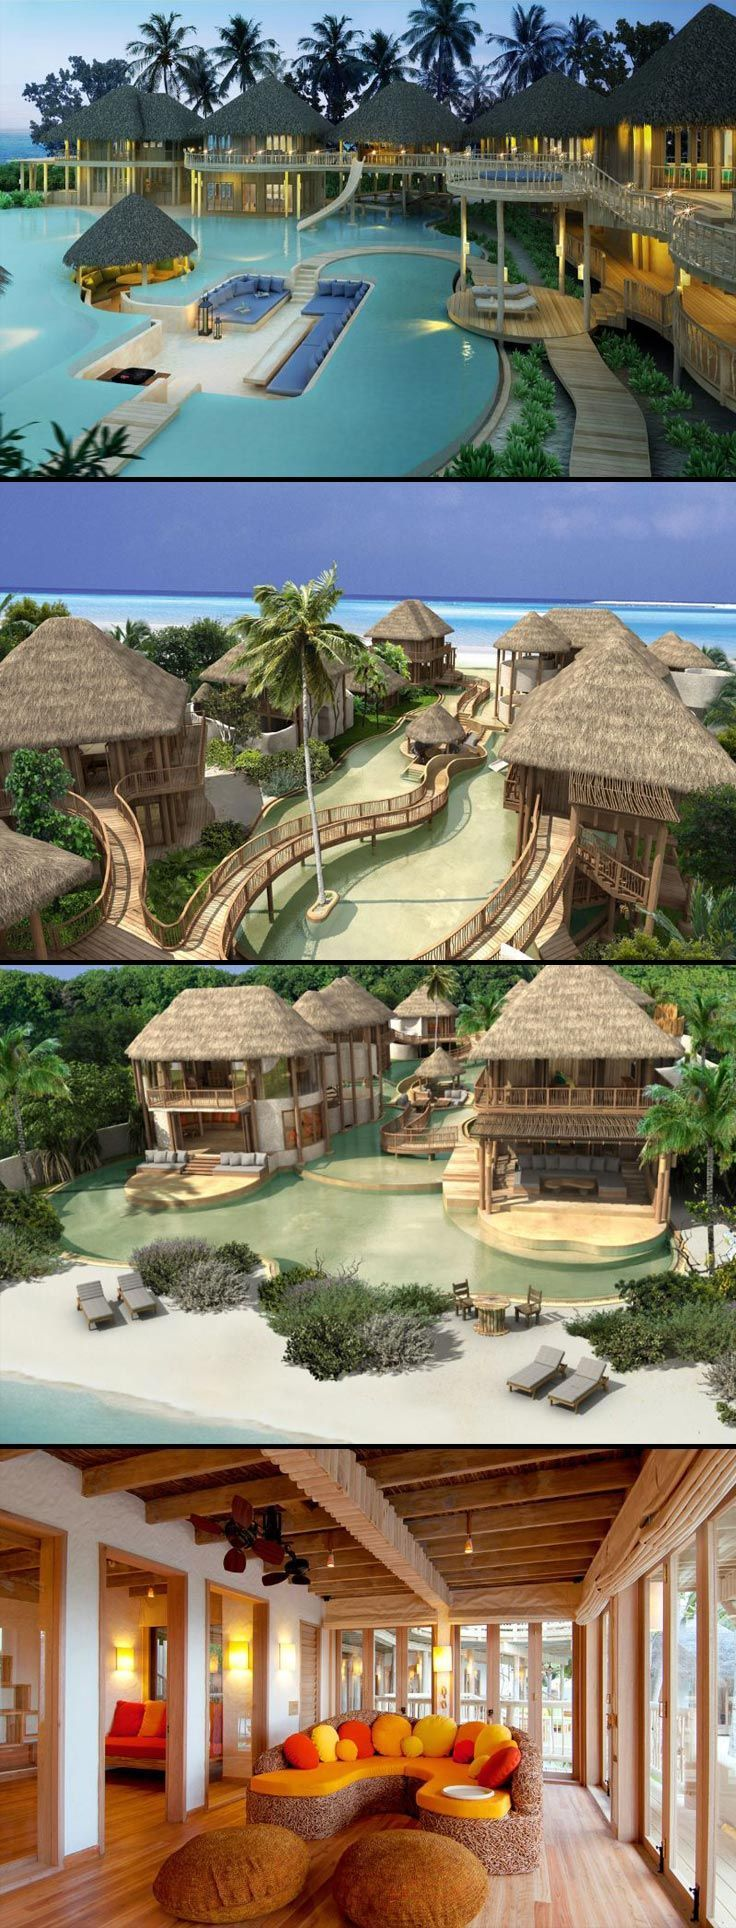 The beautiful island resort of Soneva Fushi, Maldives.